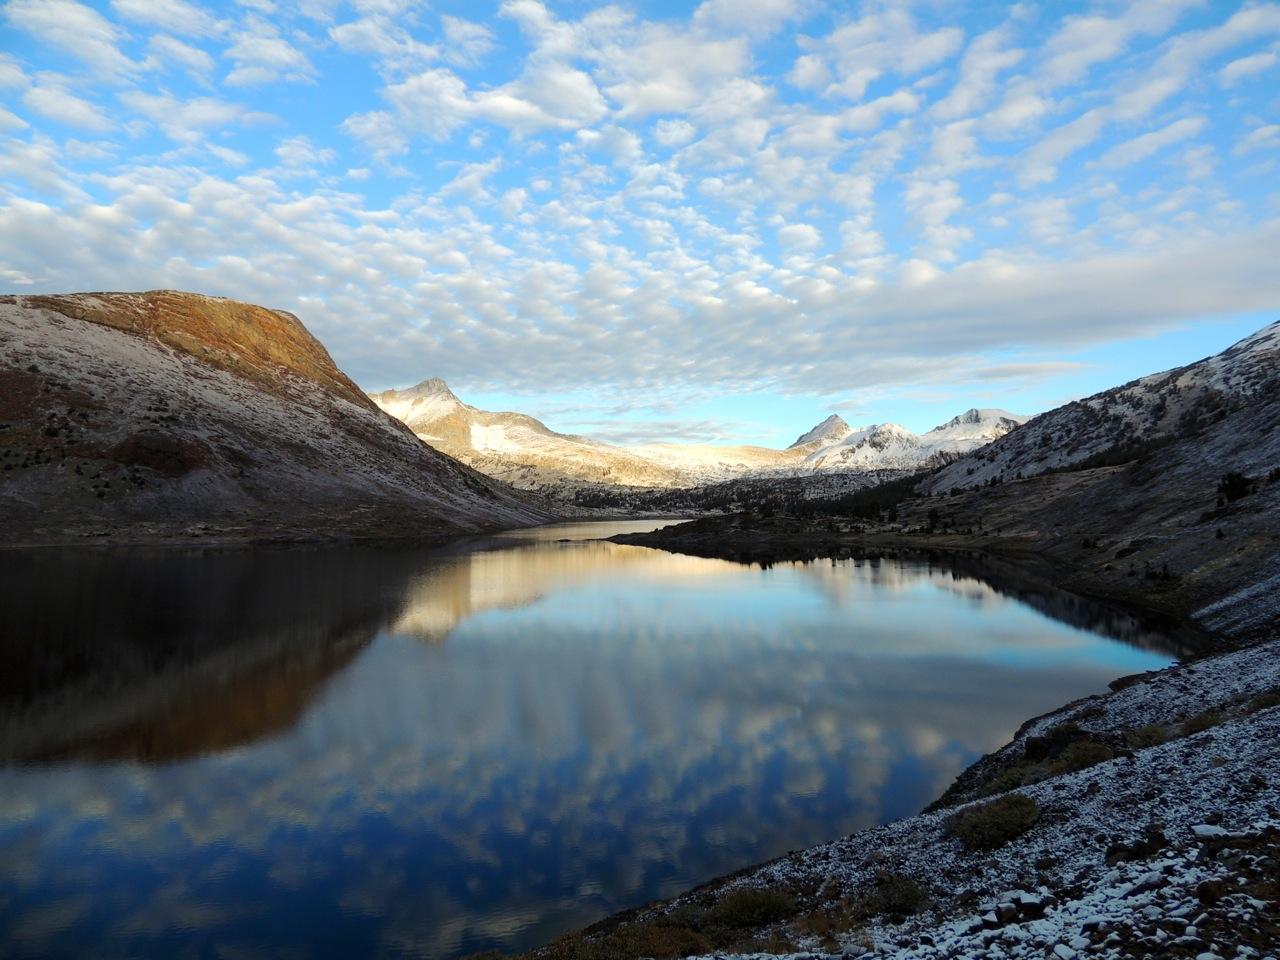 Saddlebag Lake at dawn, after a night of light snow